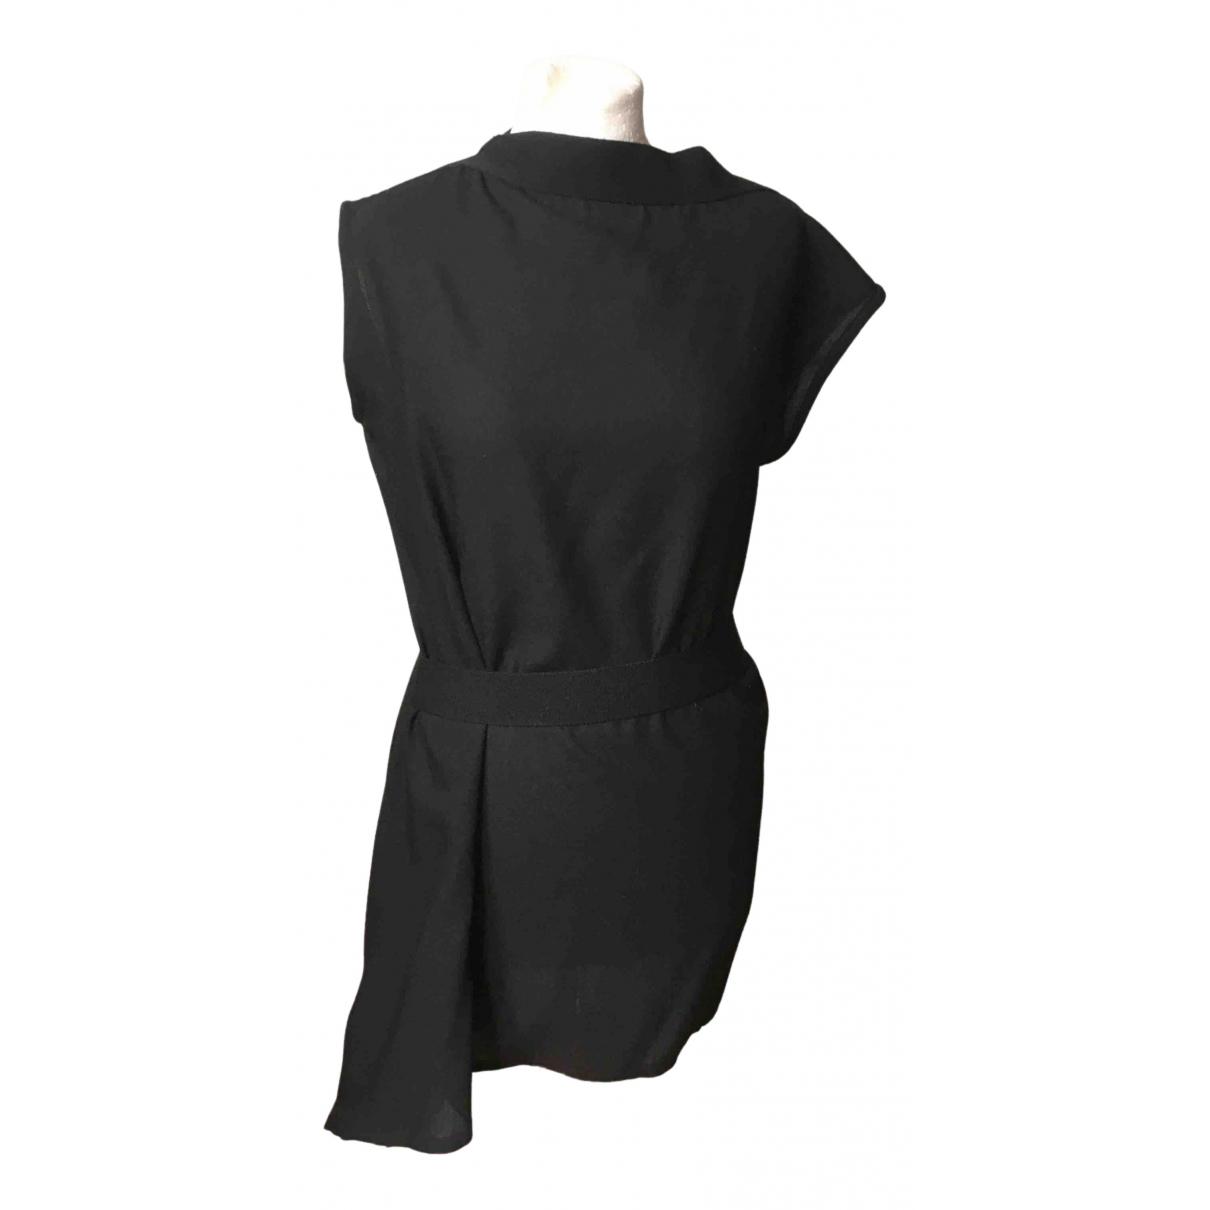 Ann Demeulemeester \N Kleid in  Schwarz Wolle